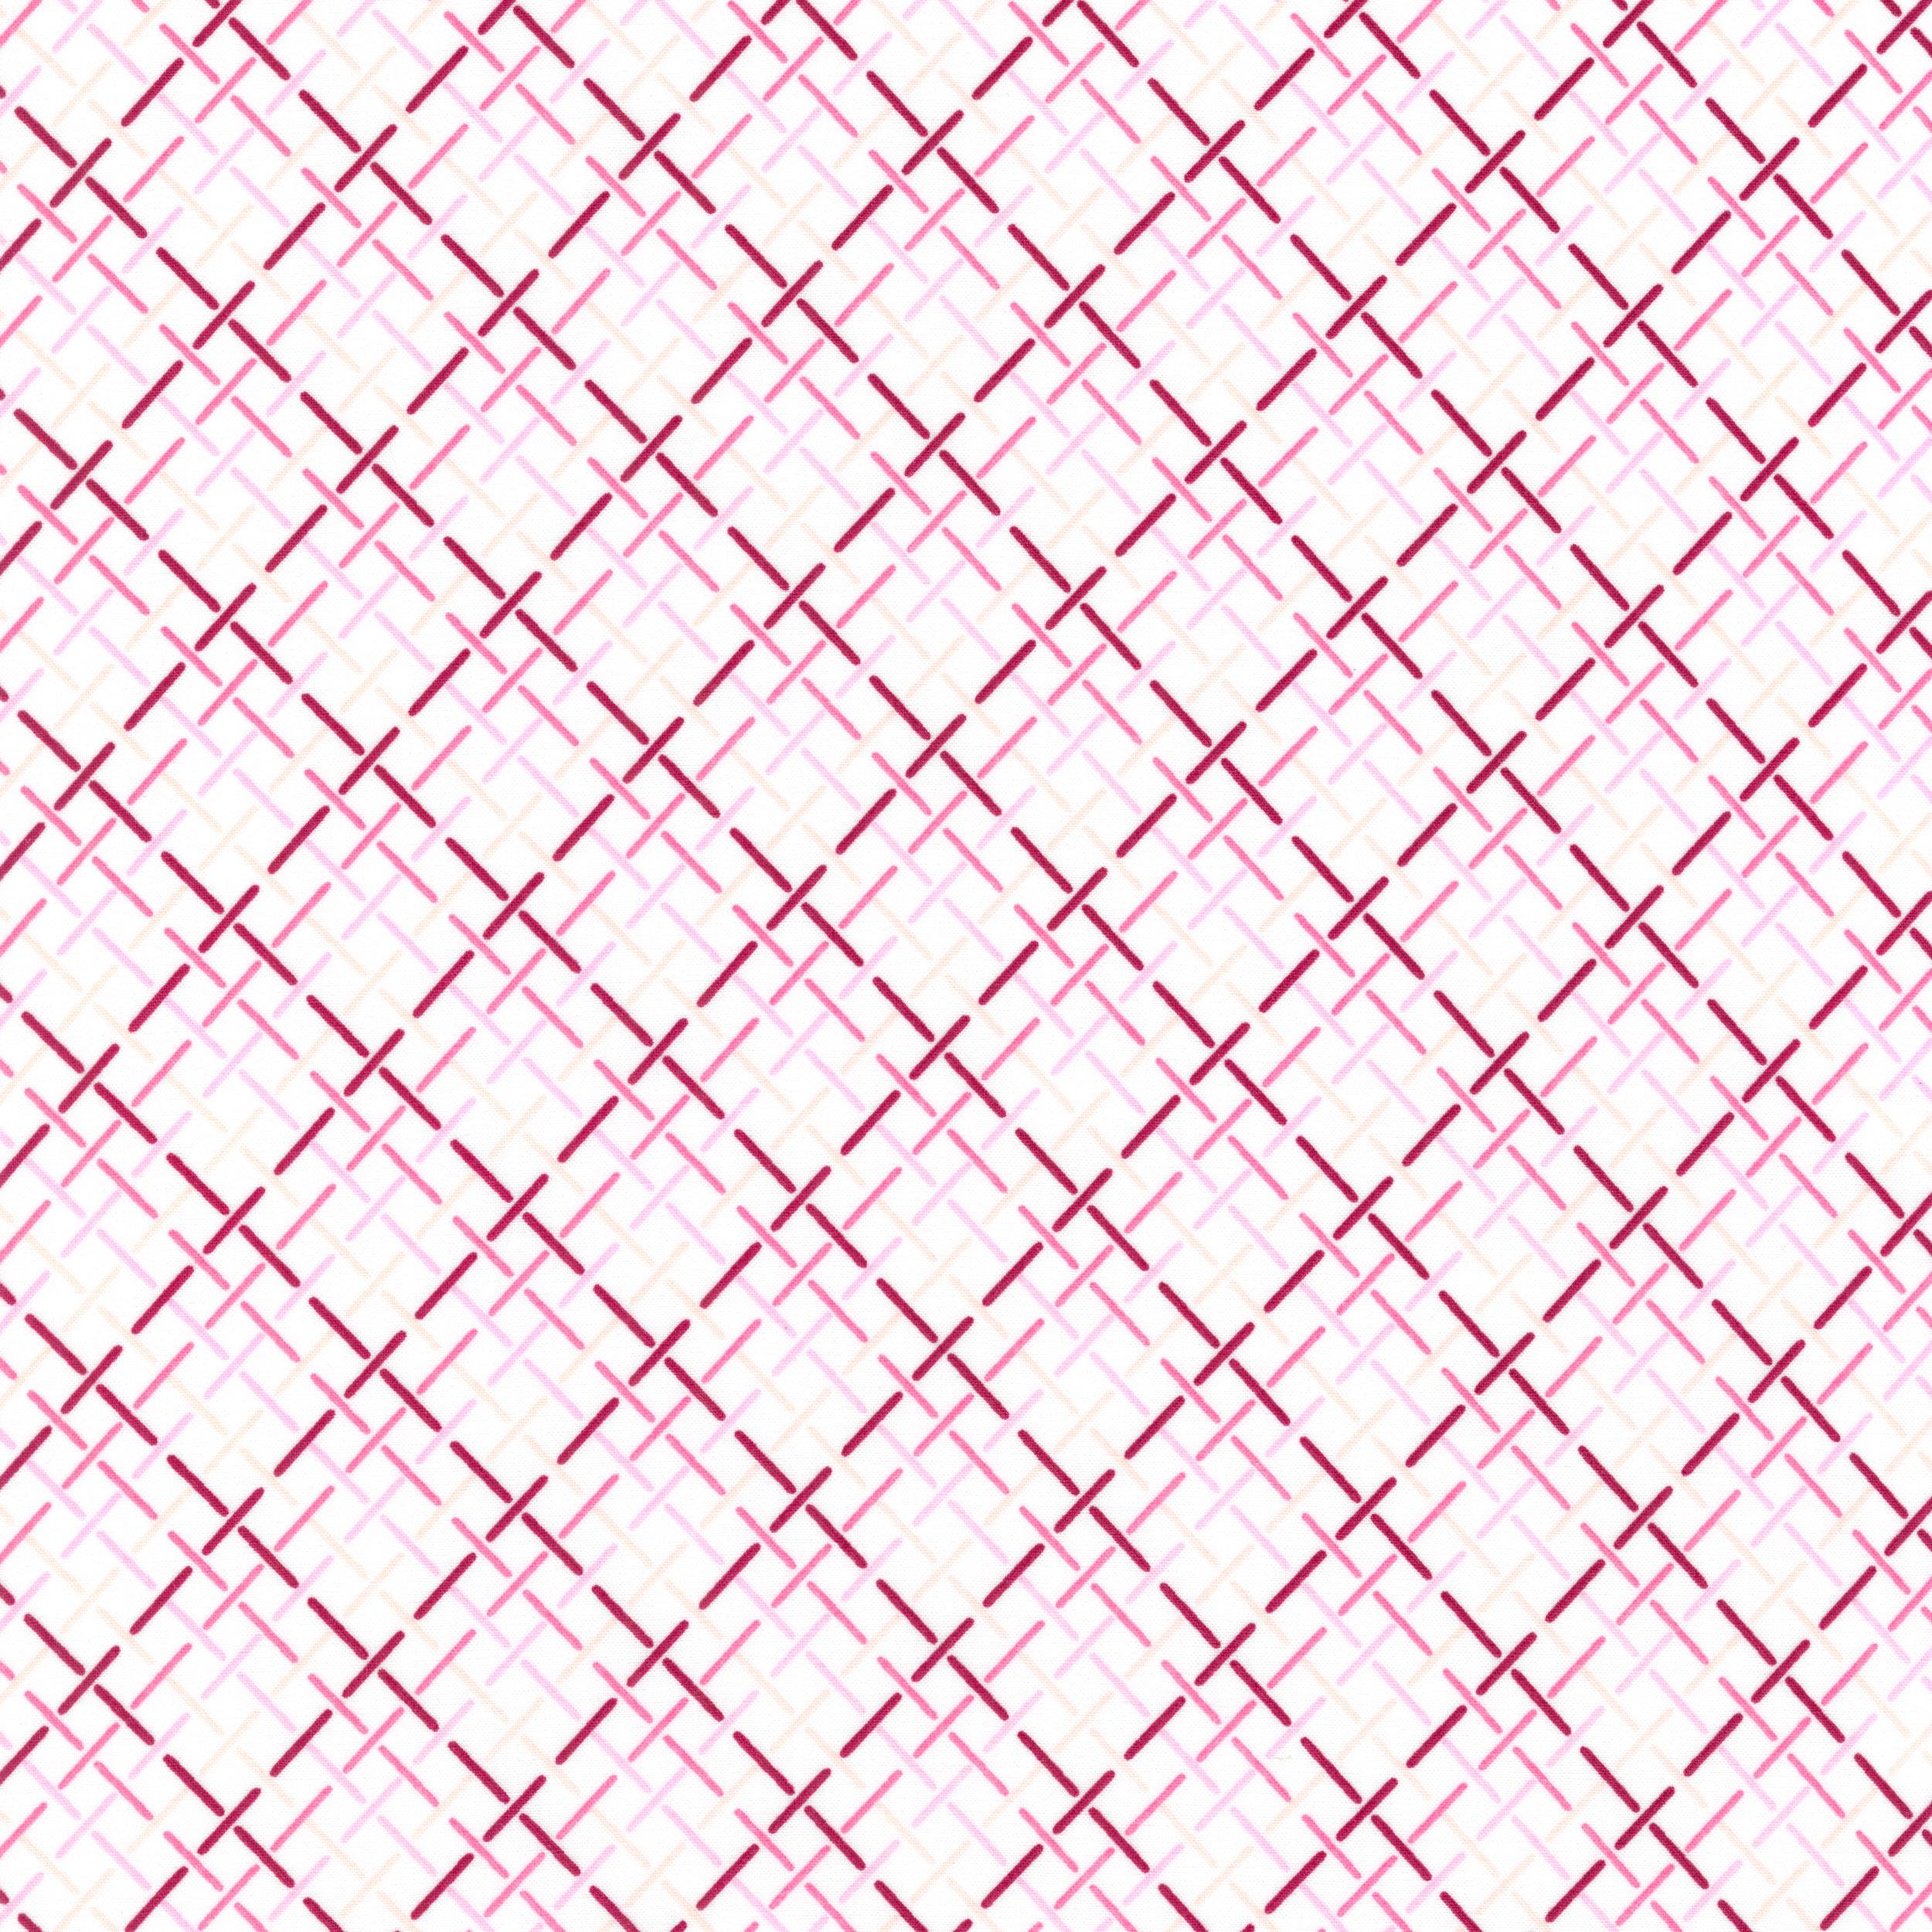 AVL-18153-107 Raffia Weave PETAL